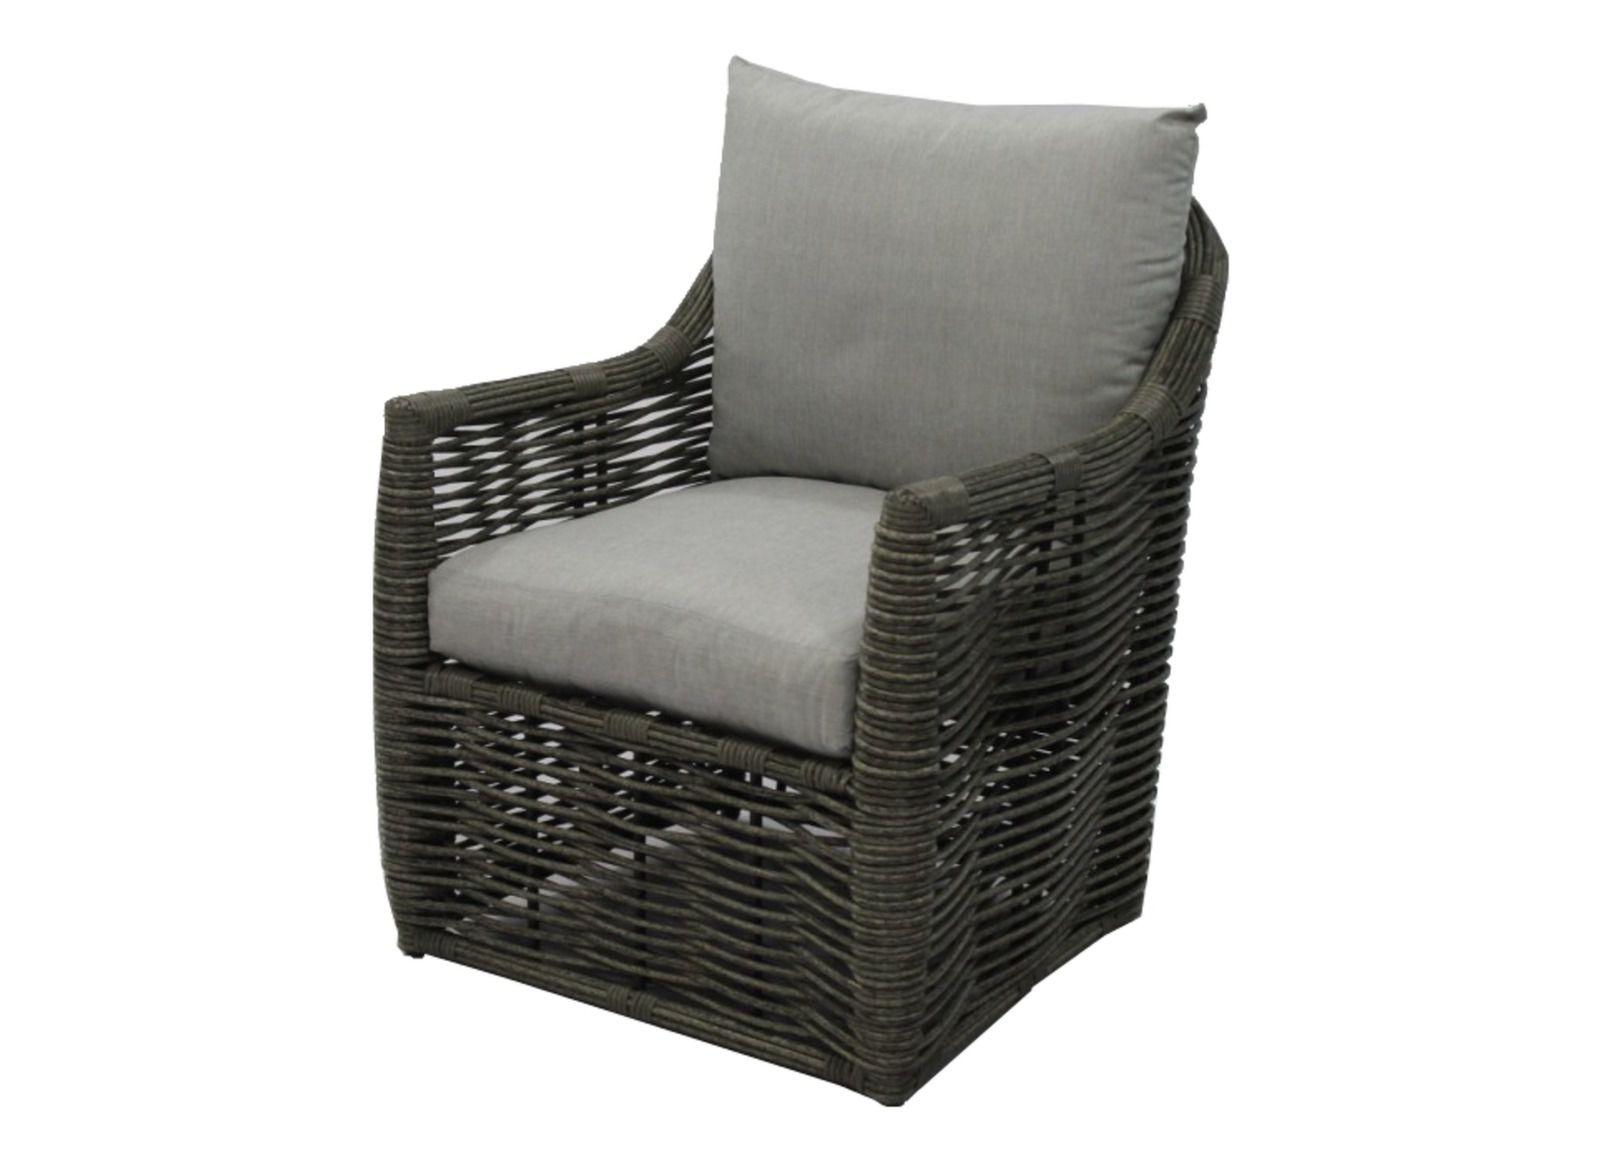 Promotion fauteuil de jardin cane en r sine tress e proloisirs - Fauteuil detente jardin ...